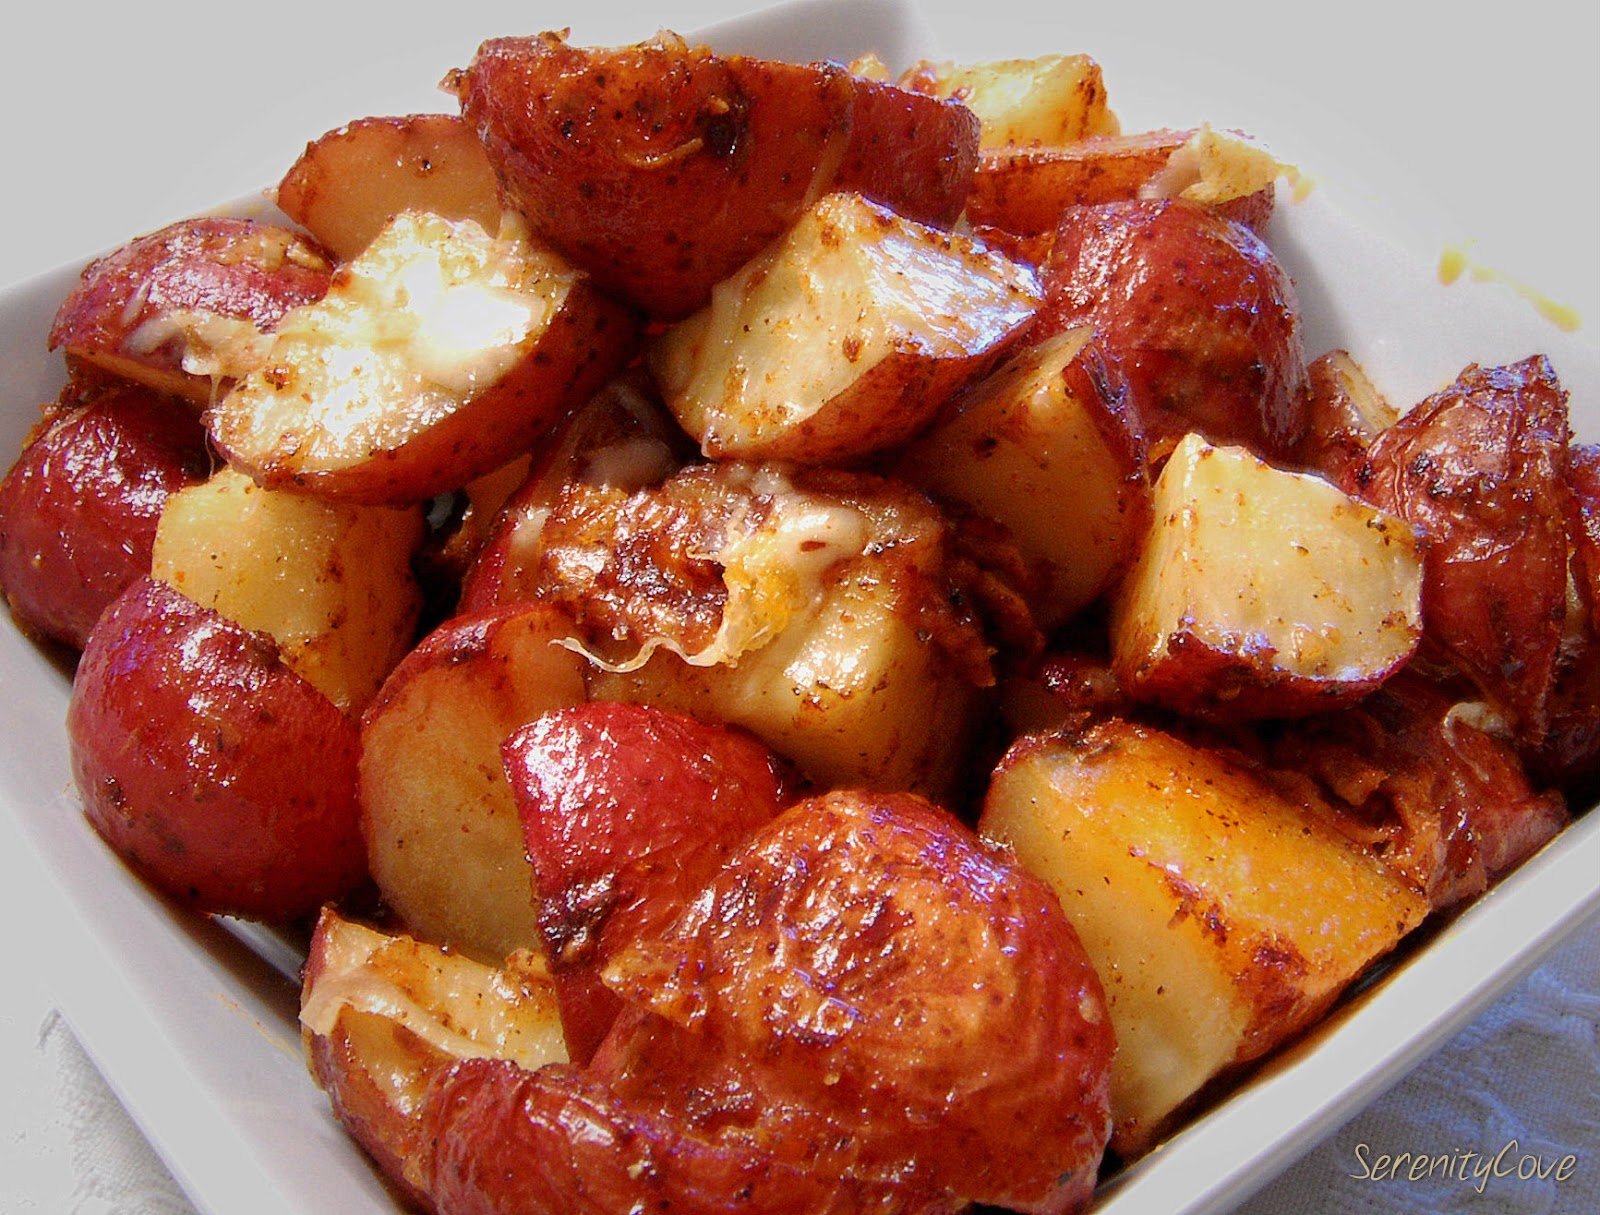 Serenity Cove: Parmesan Roasted Potatoes